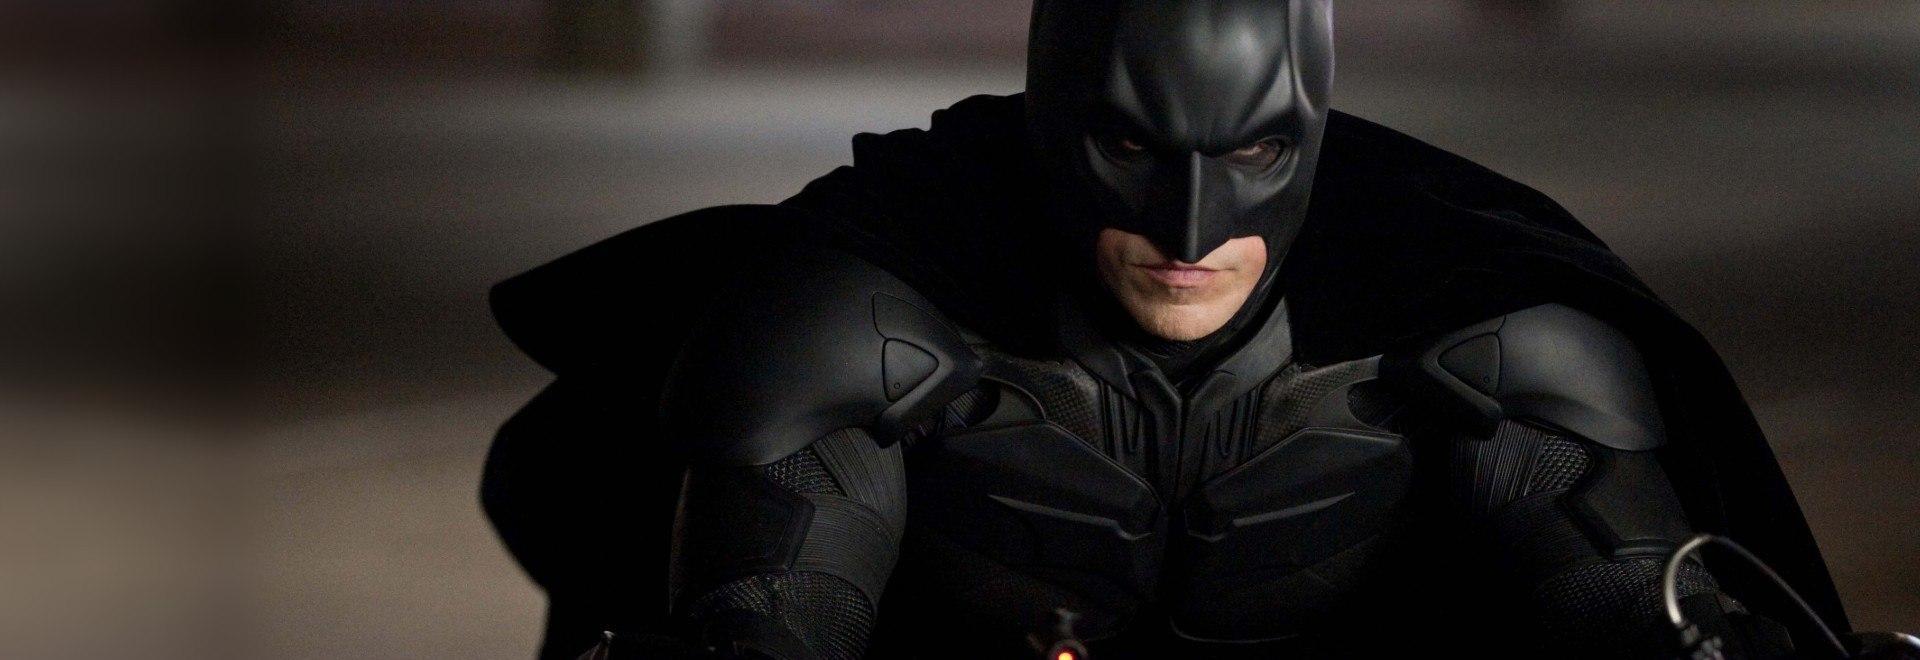 Xl - Batman - Speciale